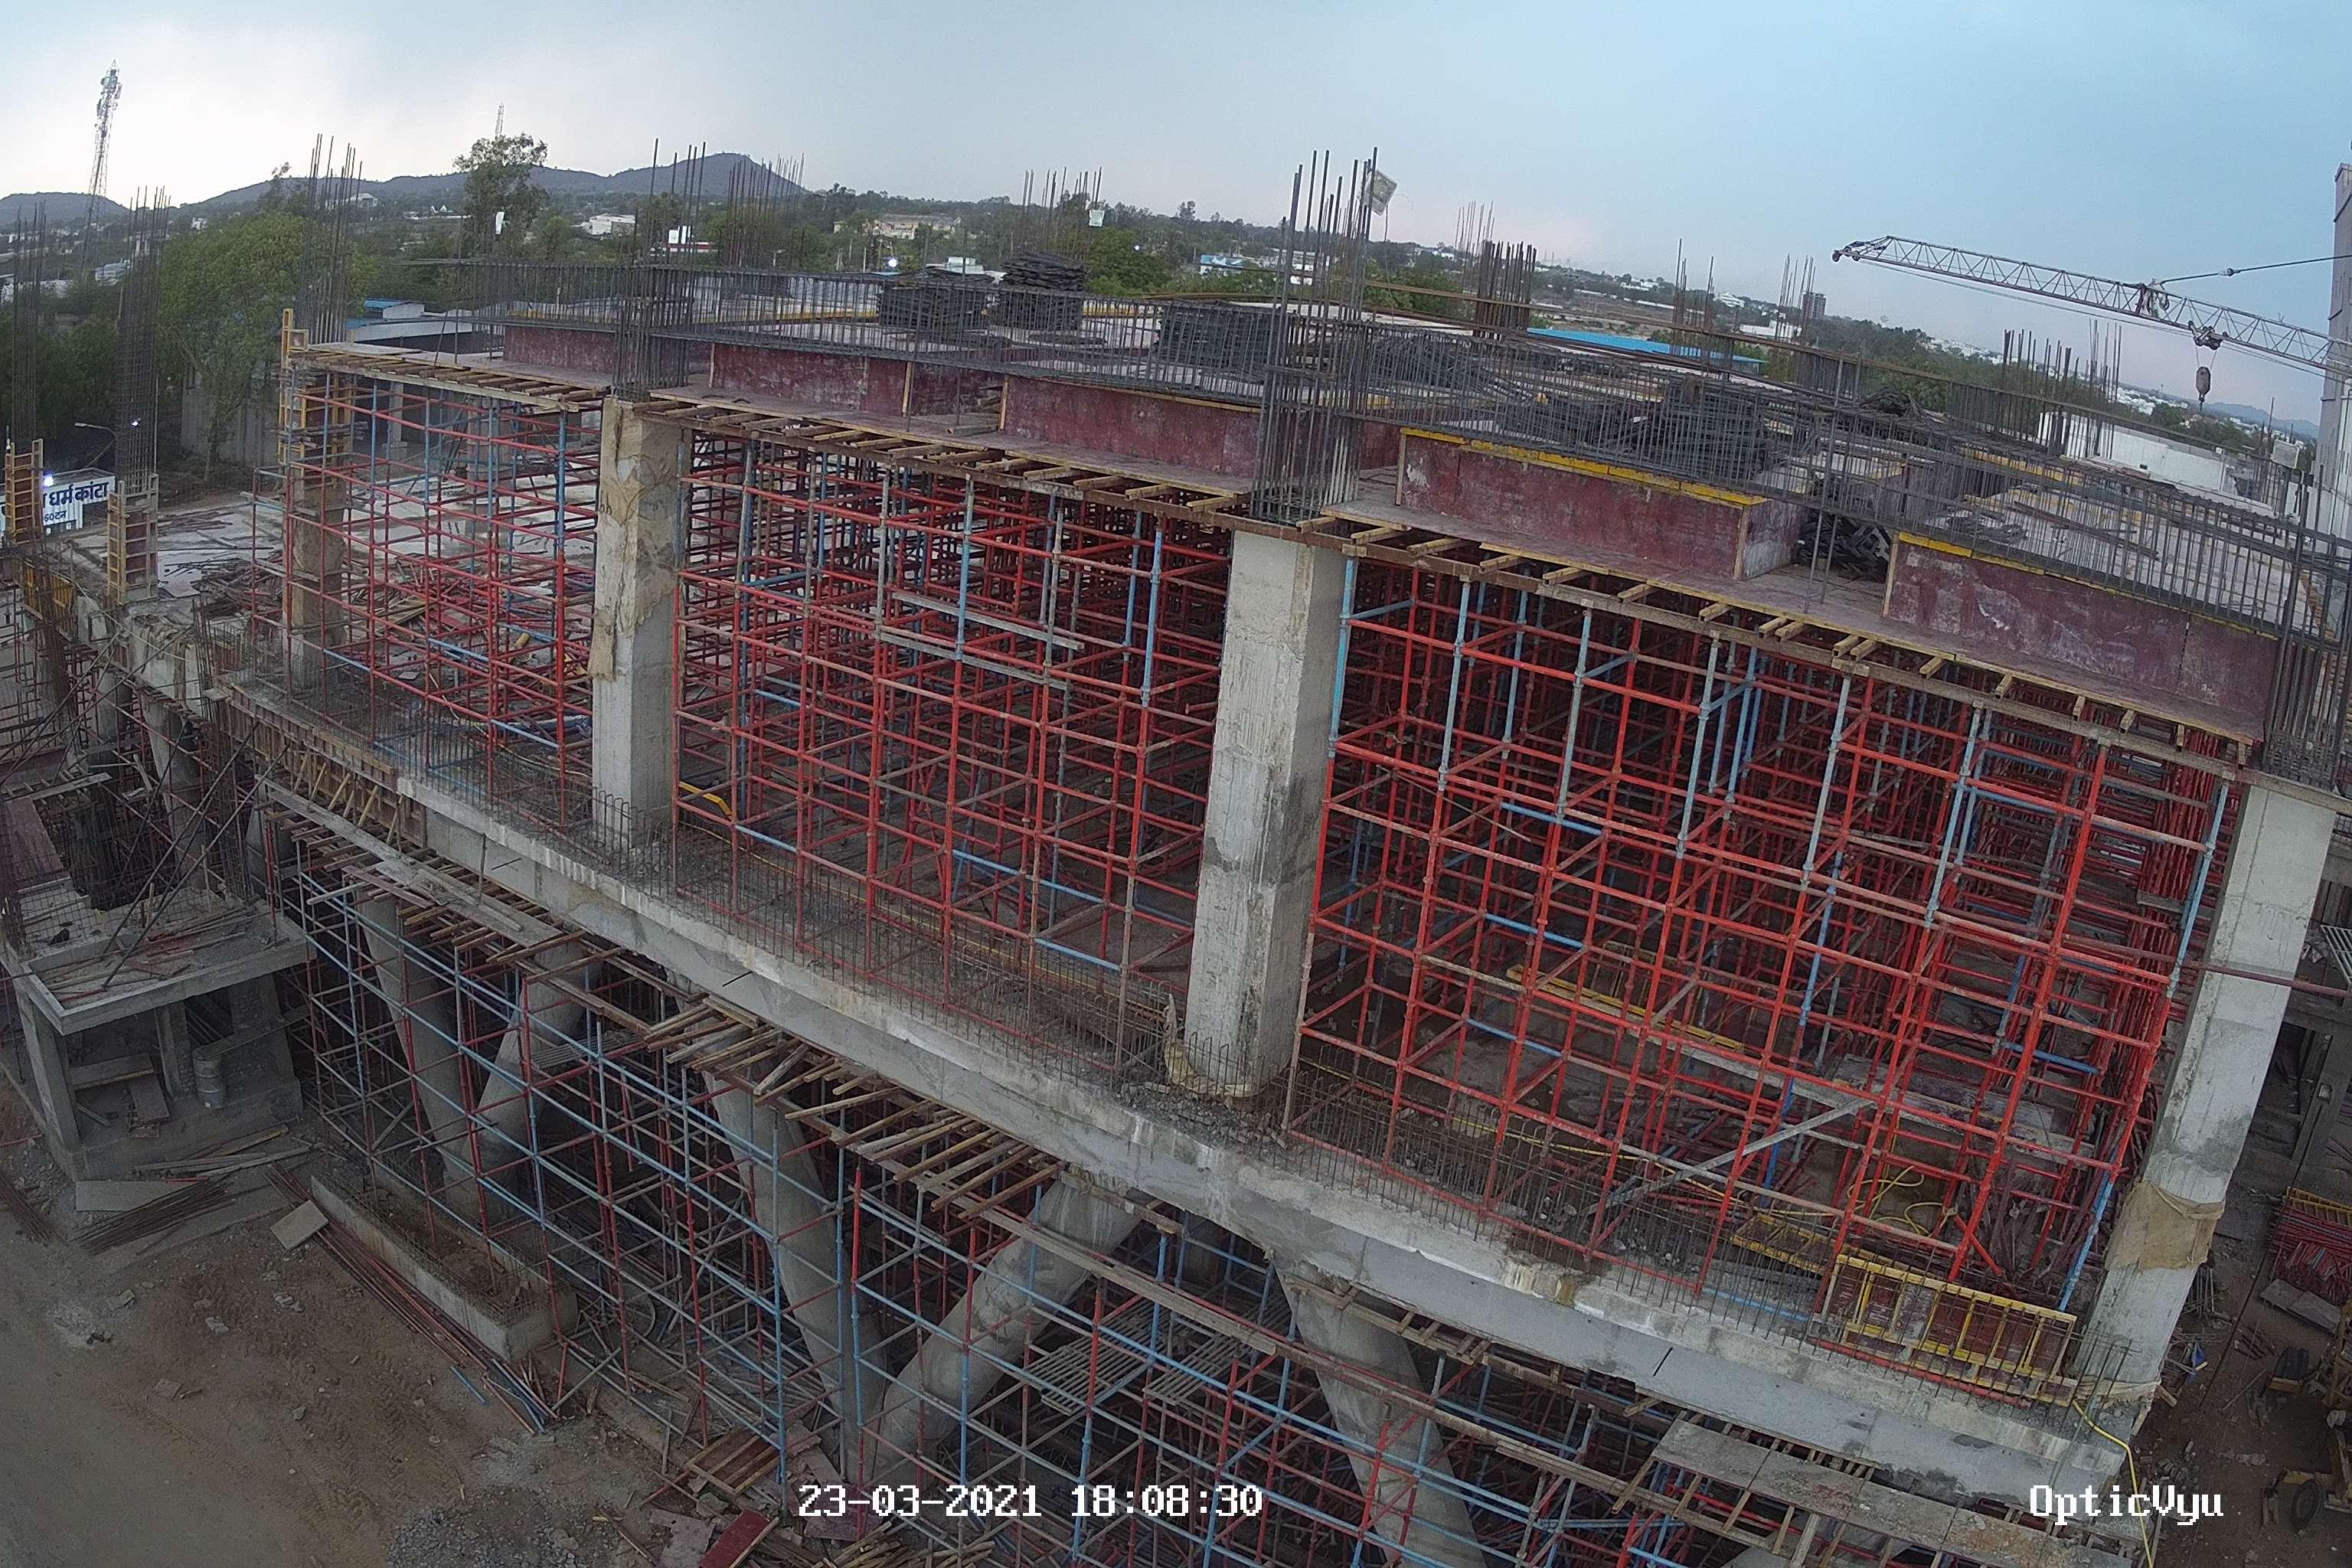 NGO Housing site handling